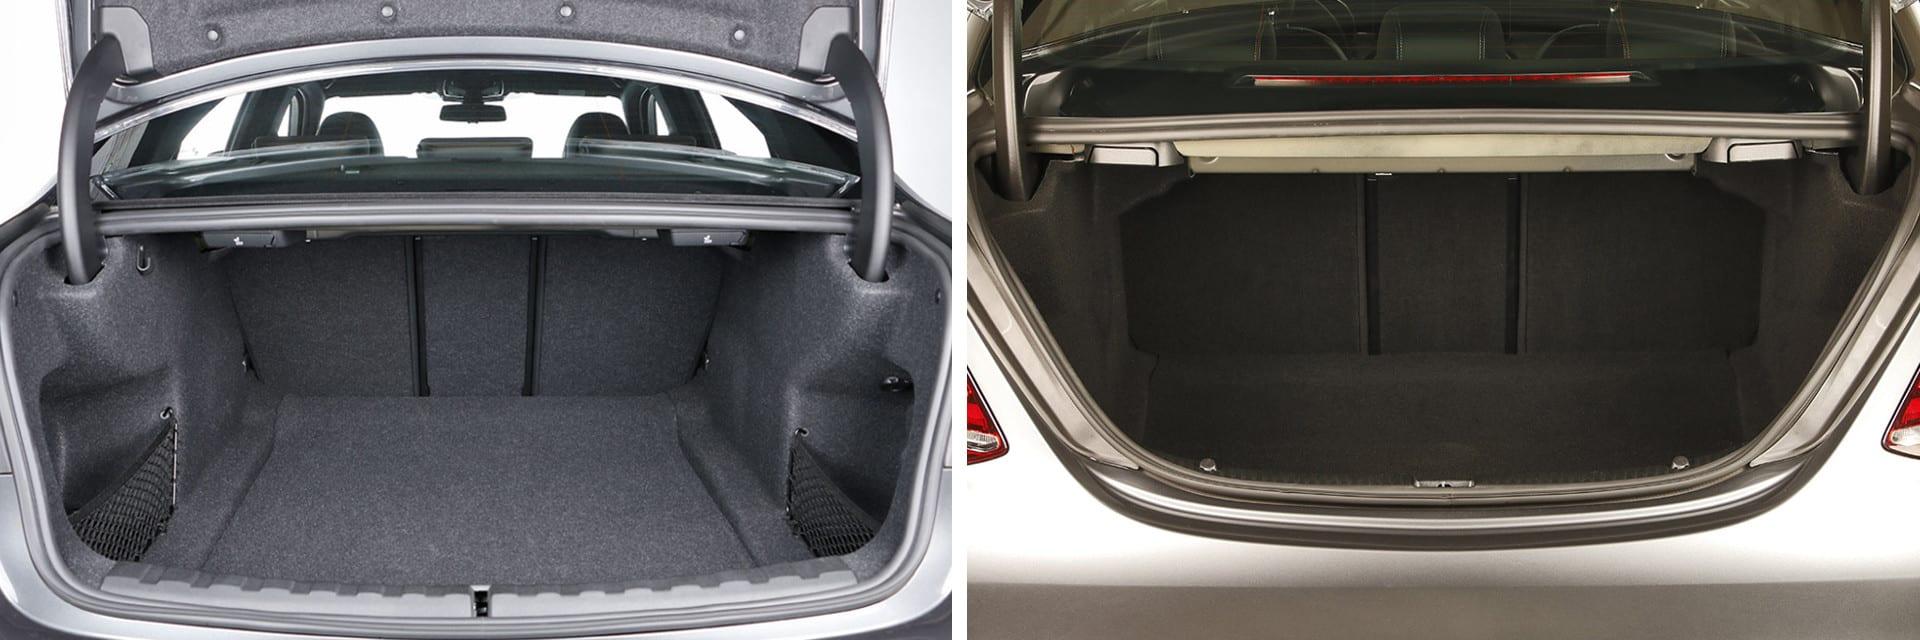 El maletero del BMW Serie 3 (izq.) es 25 litros más amplio que el del Mercedes-Benz Clase C (izq.): 480 litros frente a 455.